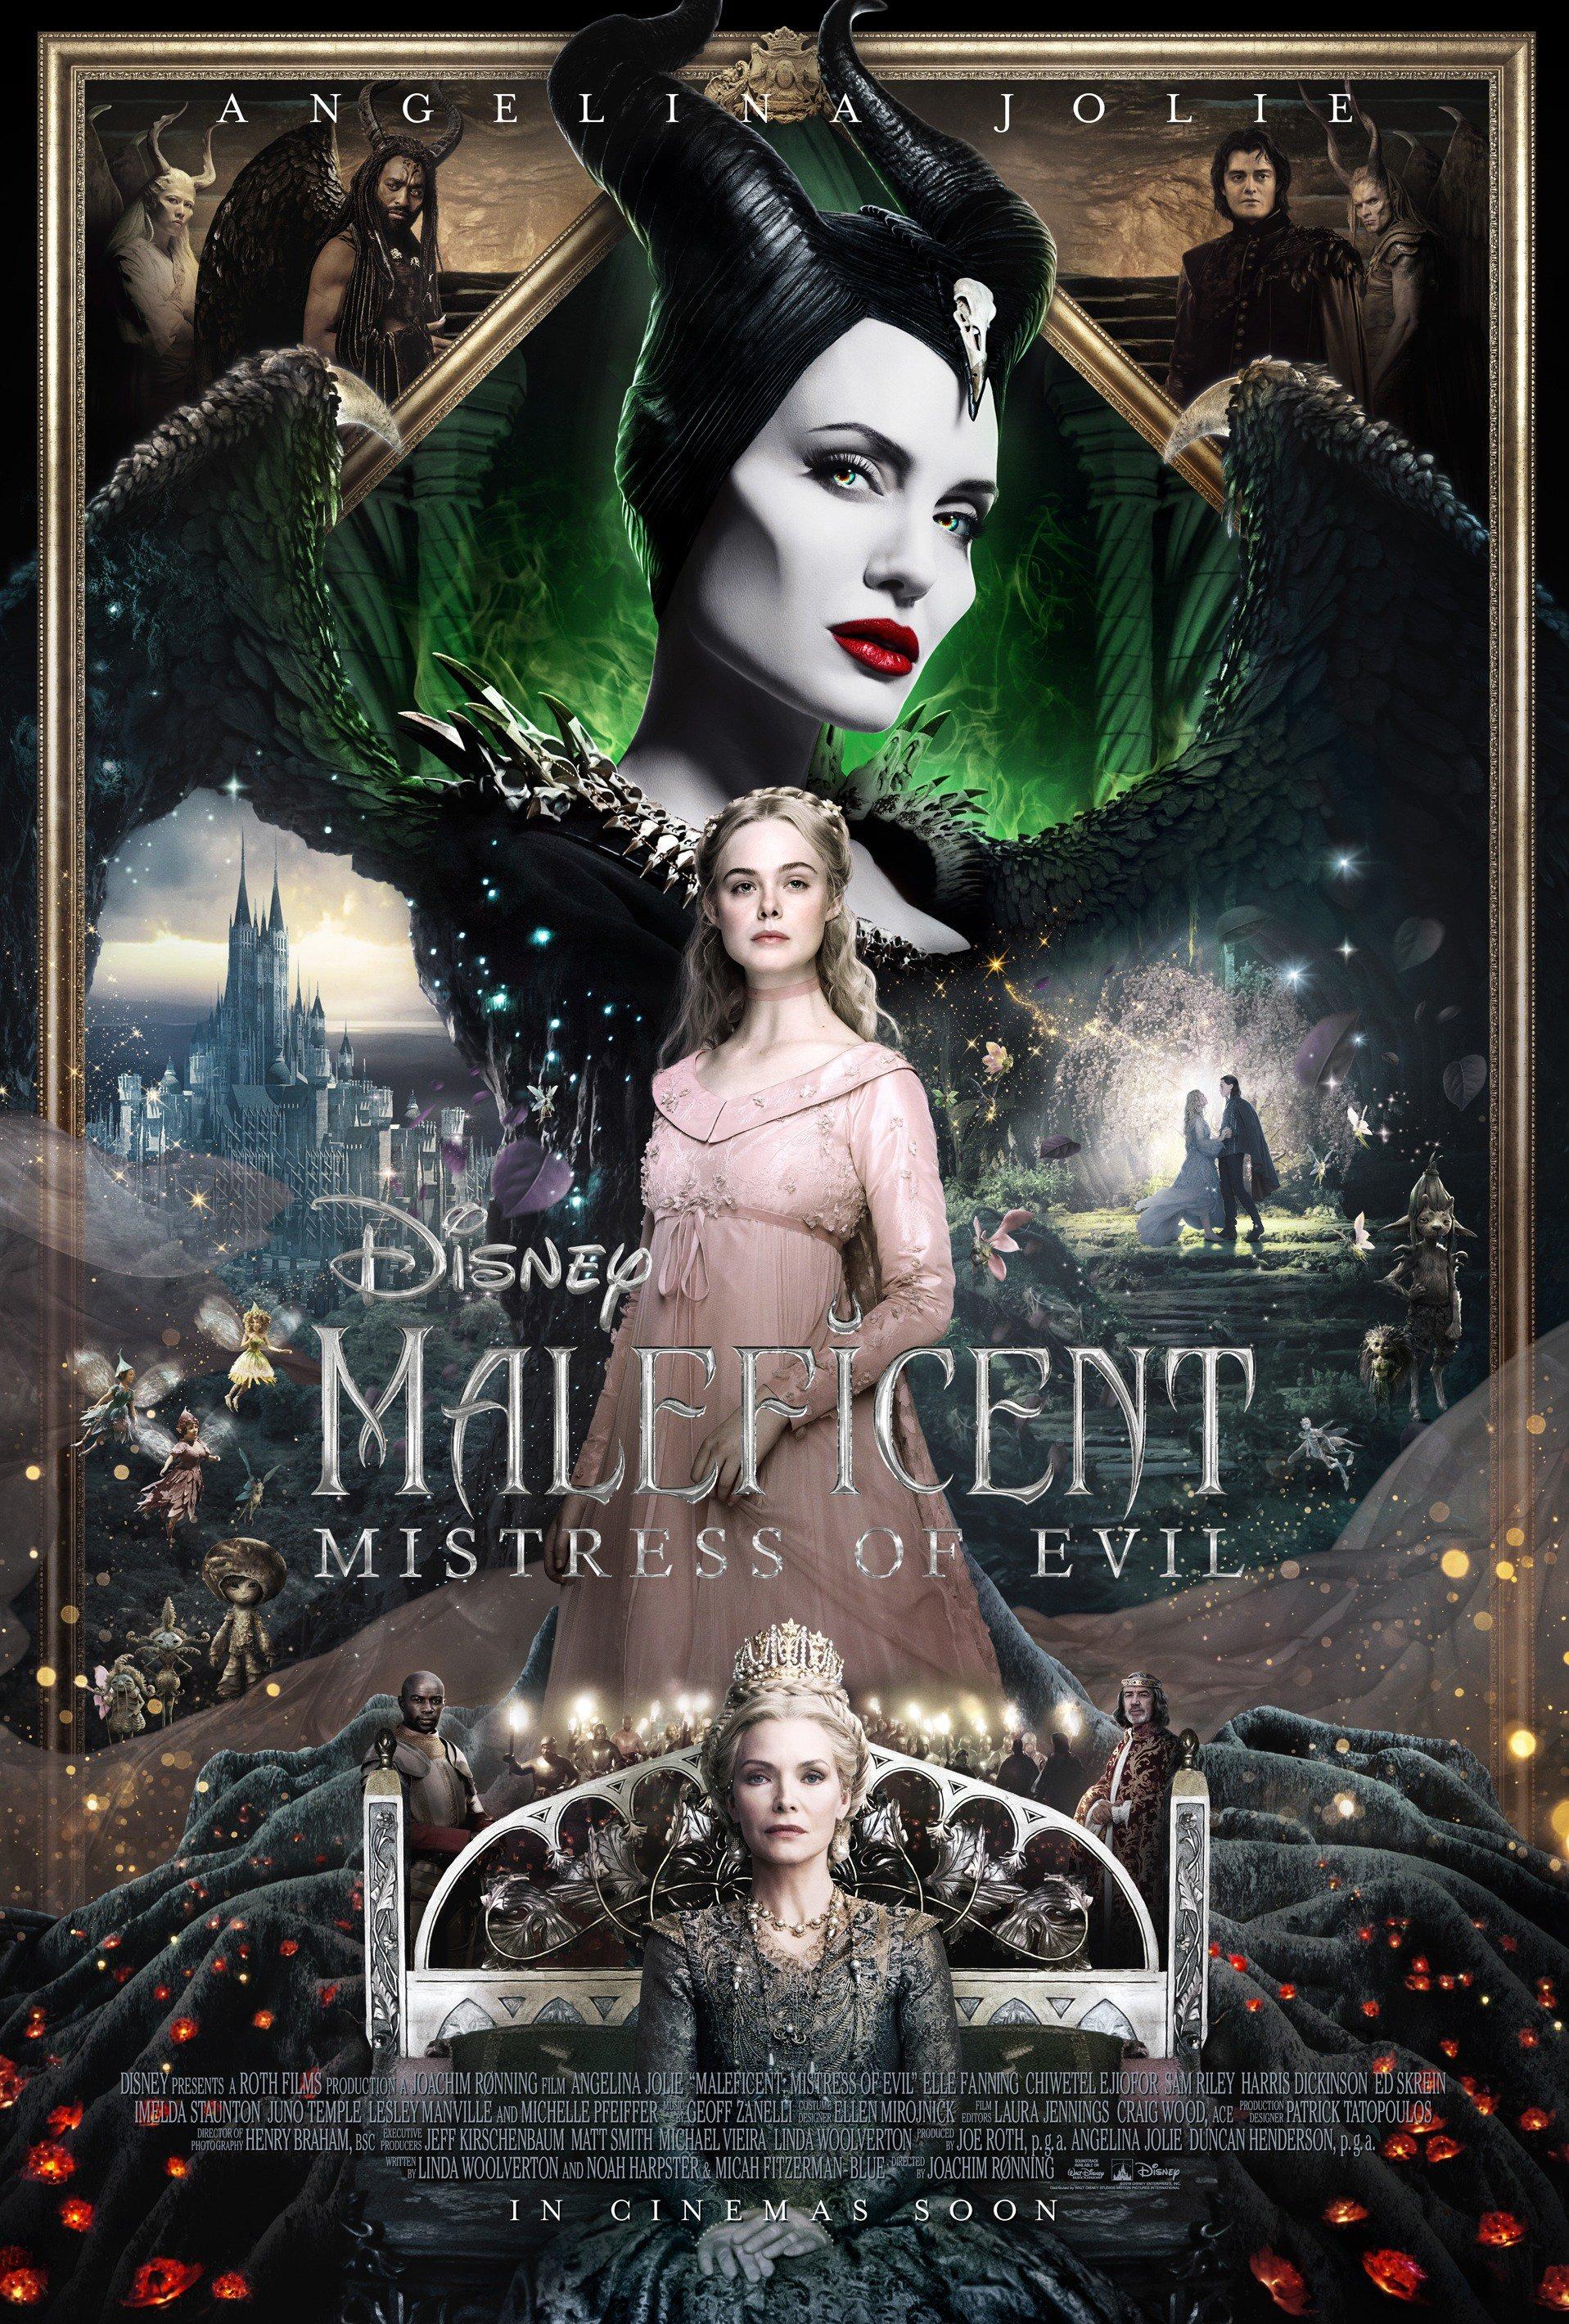 szmk_maleficent_mistress_of_evil_demona_disney_csipkerozsika_angelina_jolie_sotetseg_urnoje_2_4.jpg